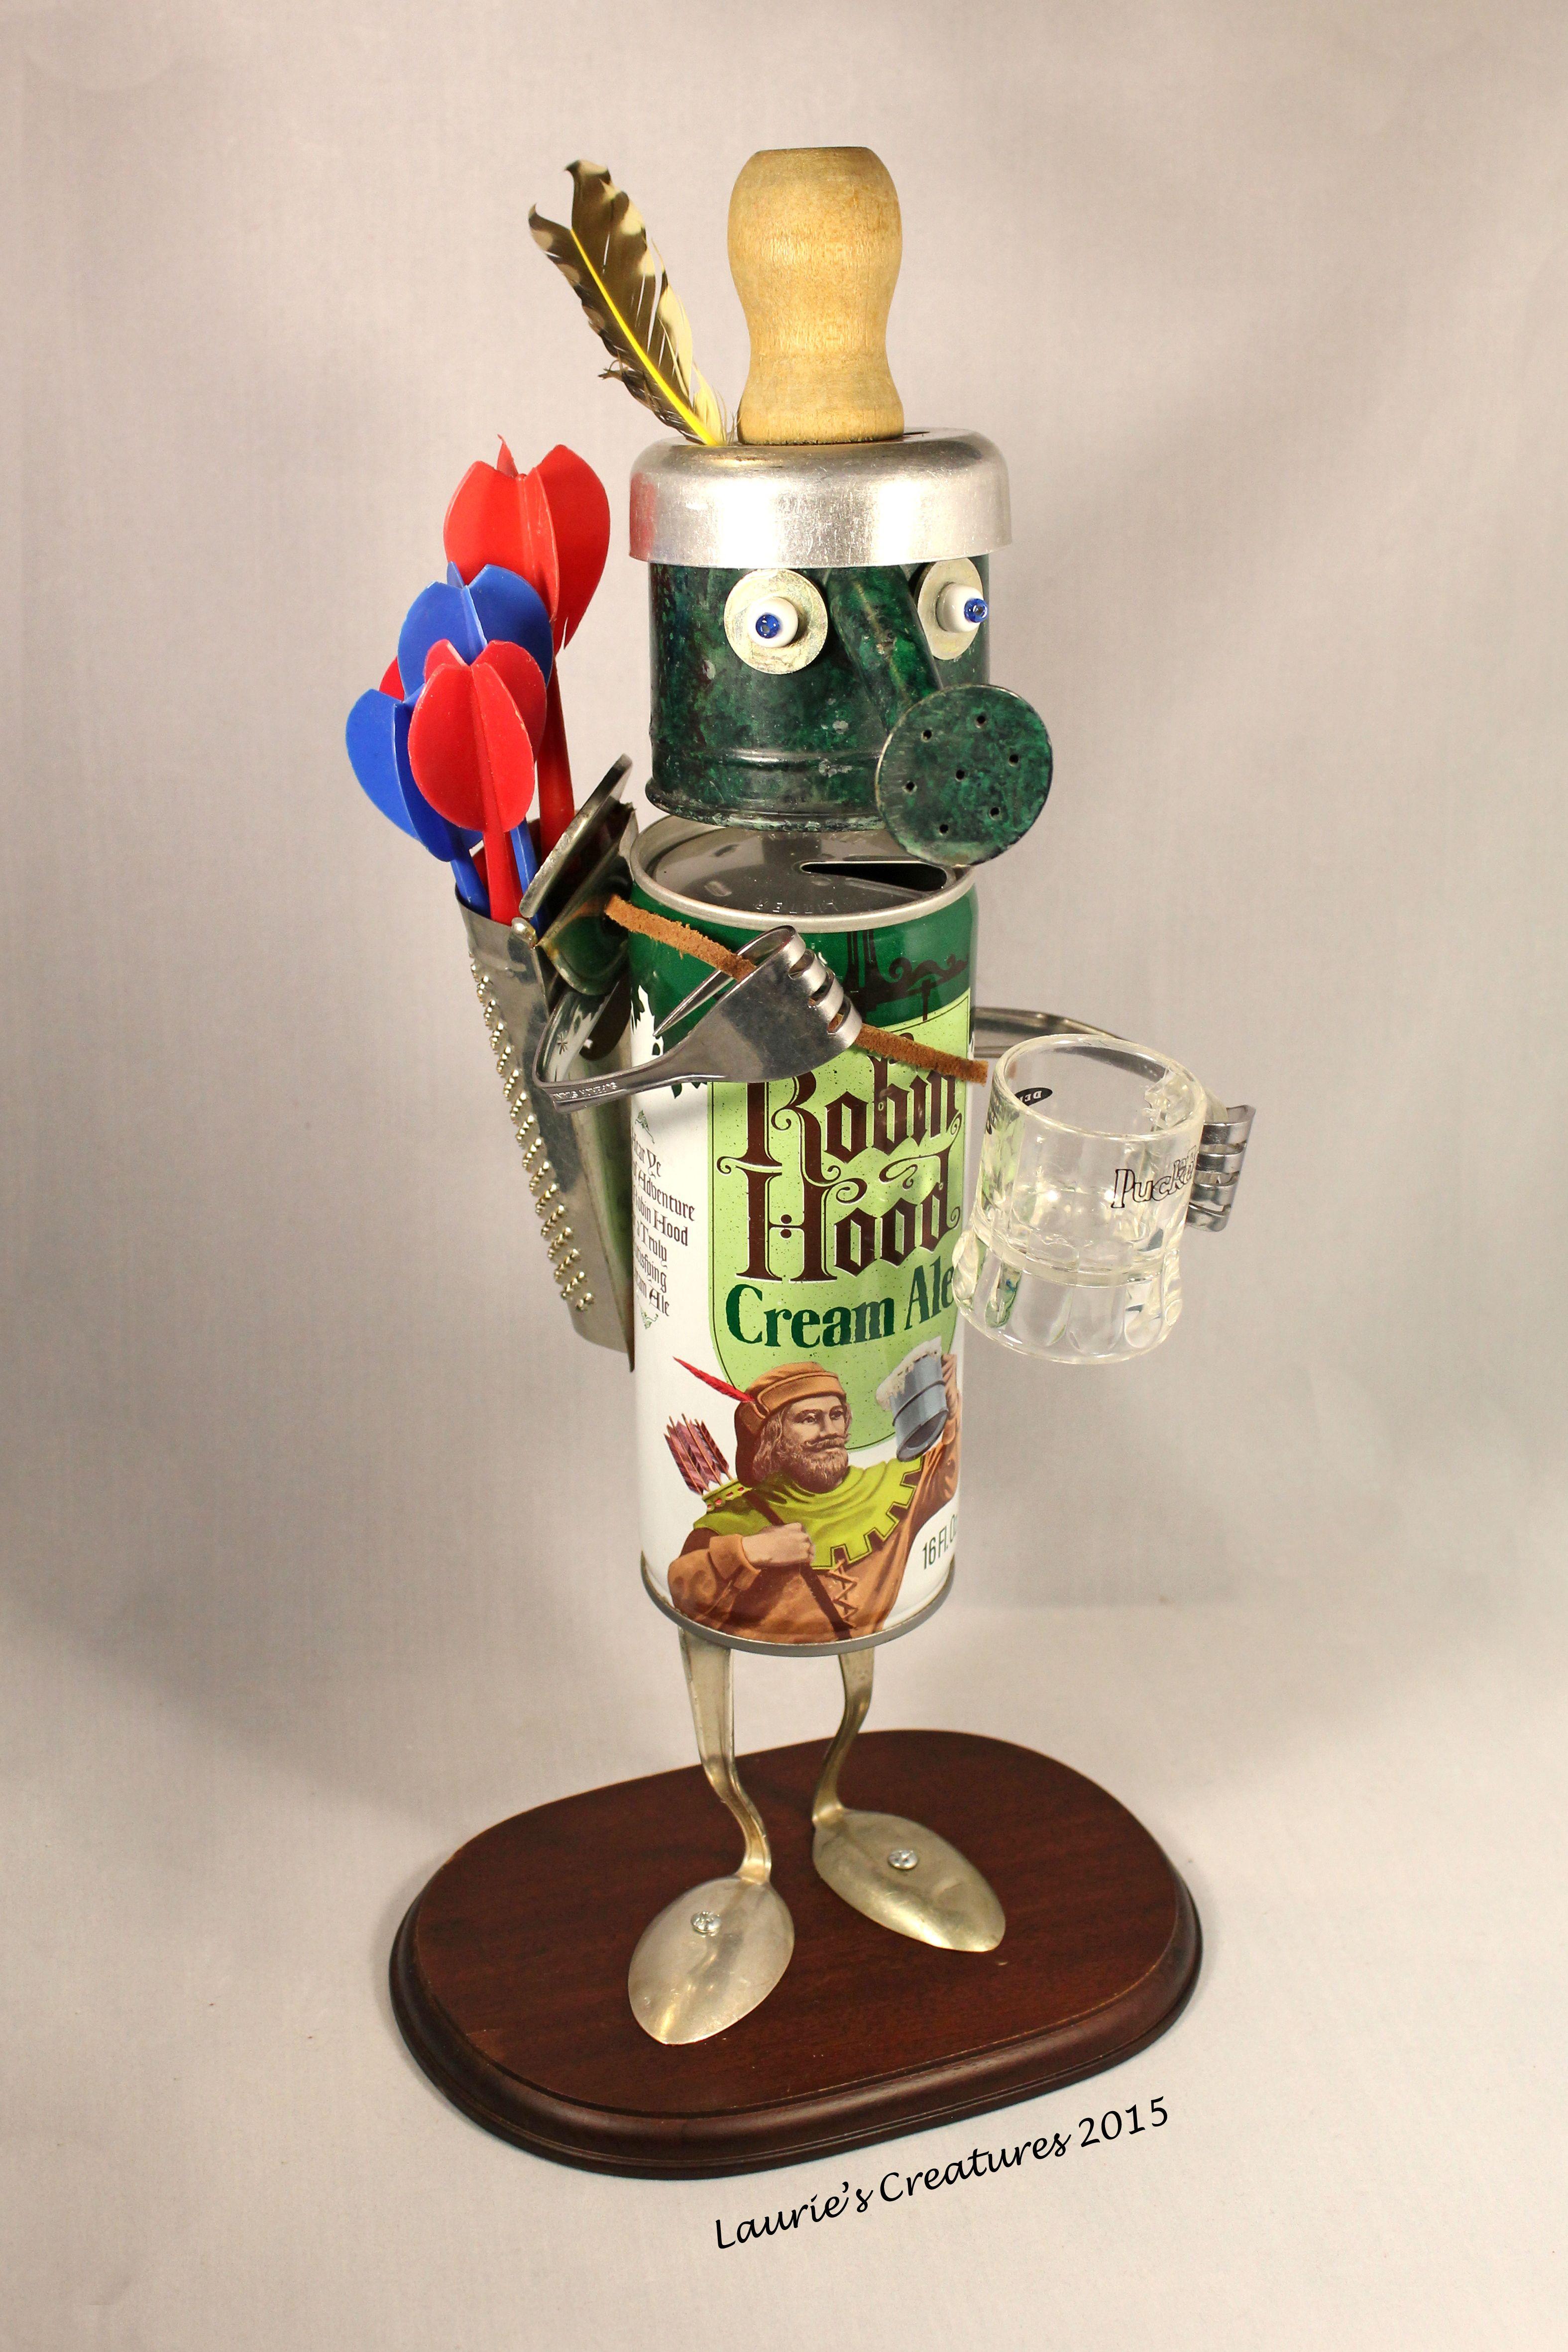 """Robin Hood"" ~ Original found object/junk art created by Laurie Schnurer in 2015."